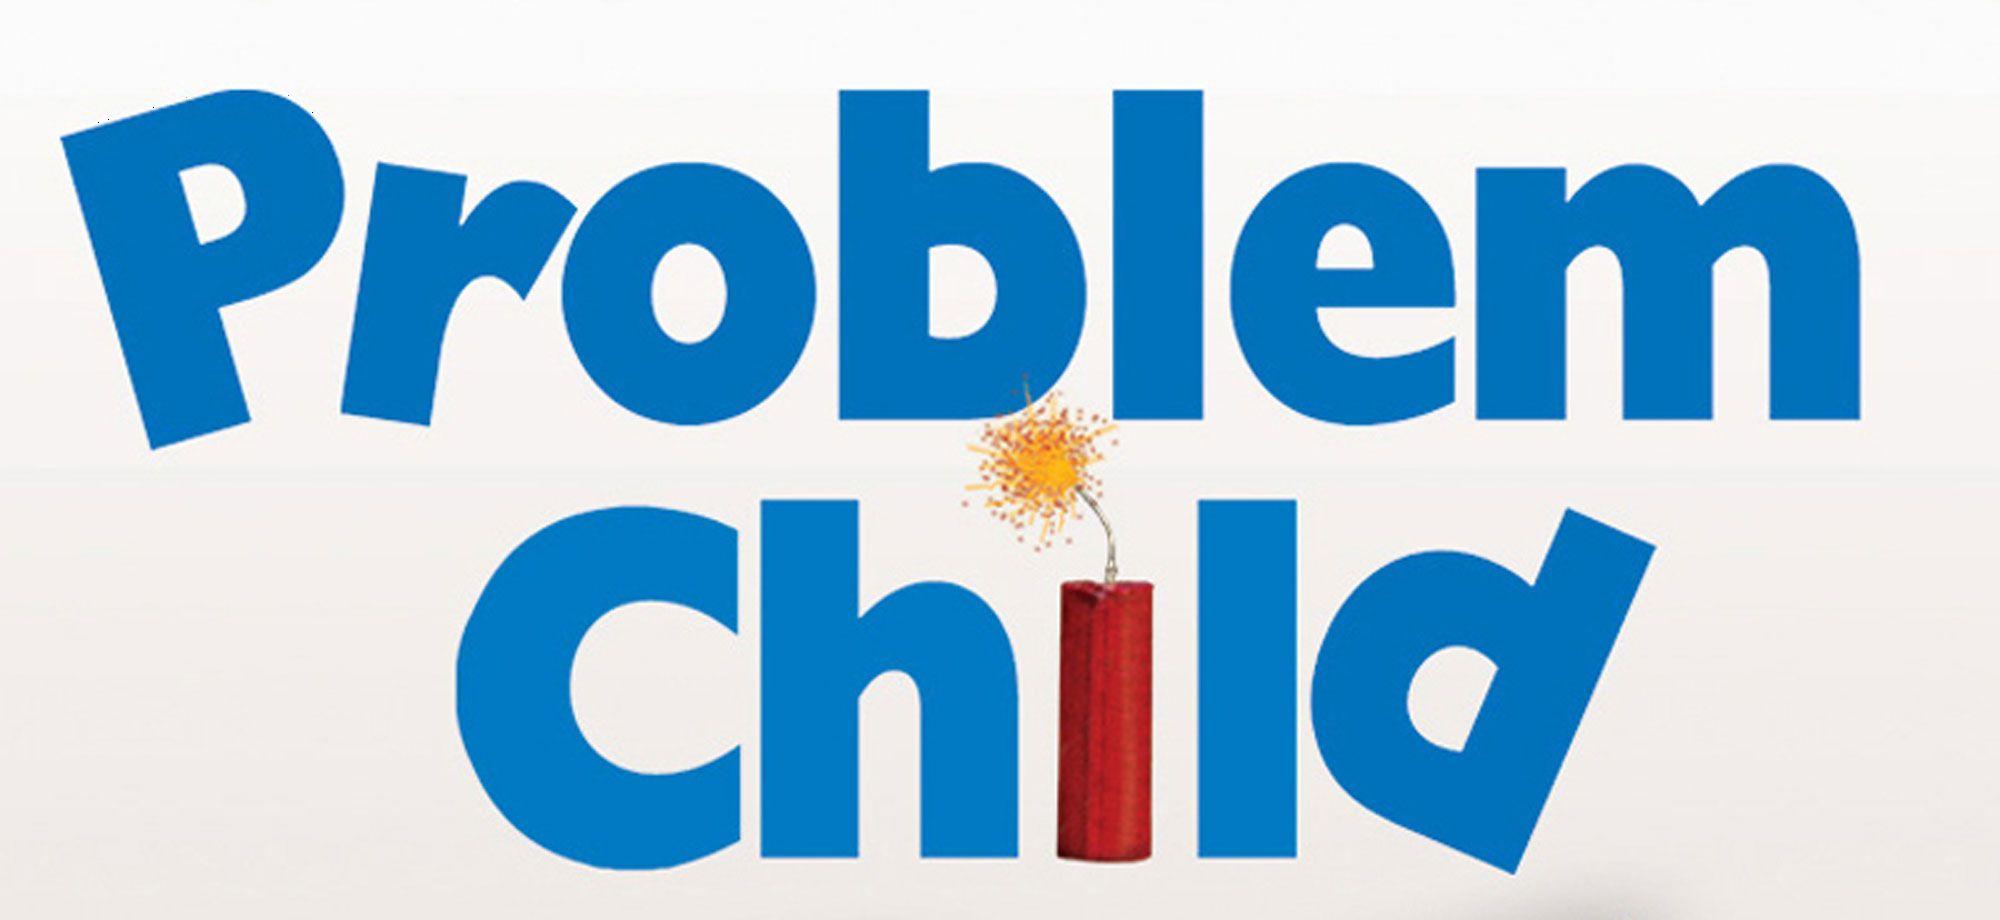 Problem Child (1990 film)